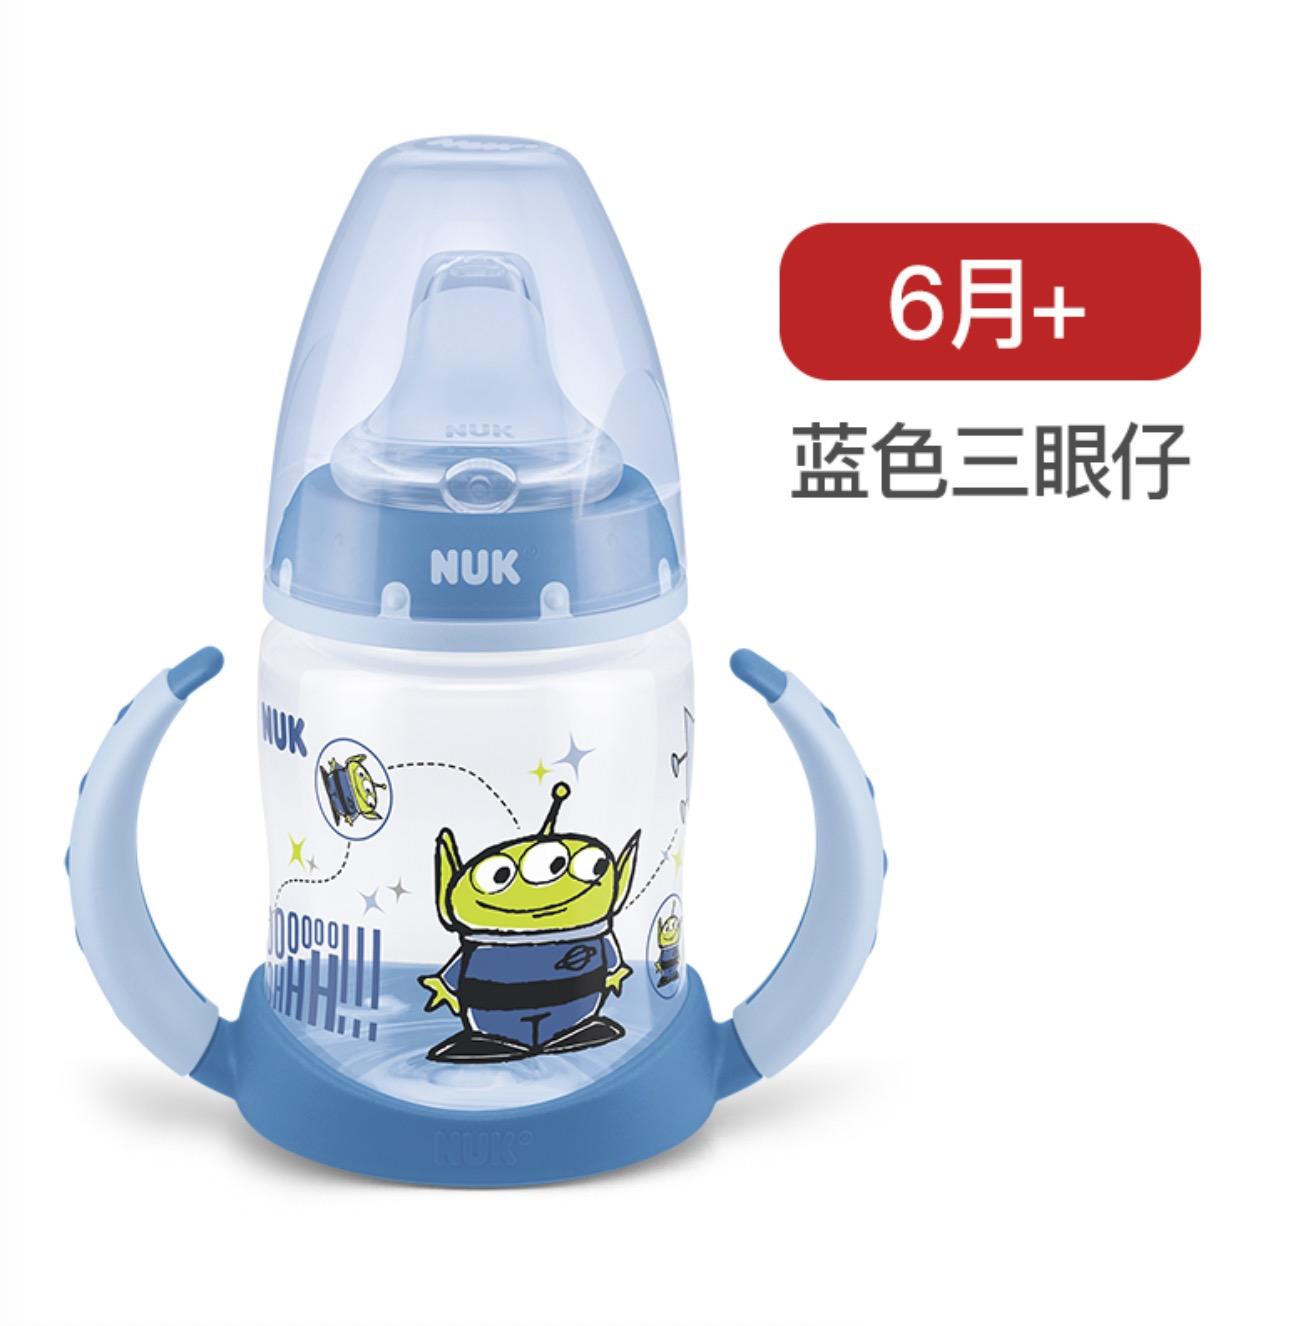 NUK 迪士尼学饮杯宽口PP两用学饮杯鸭嘴杯150ML宝宝喝水杯 玩具总动员